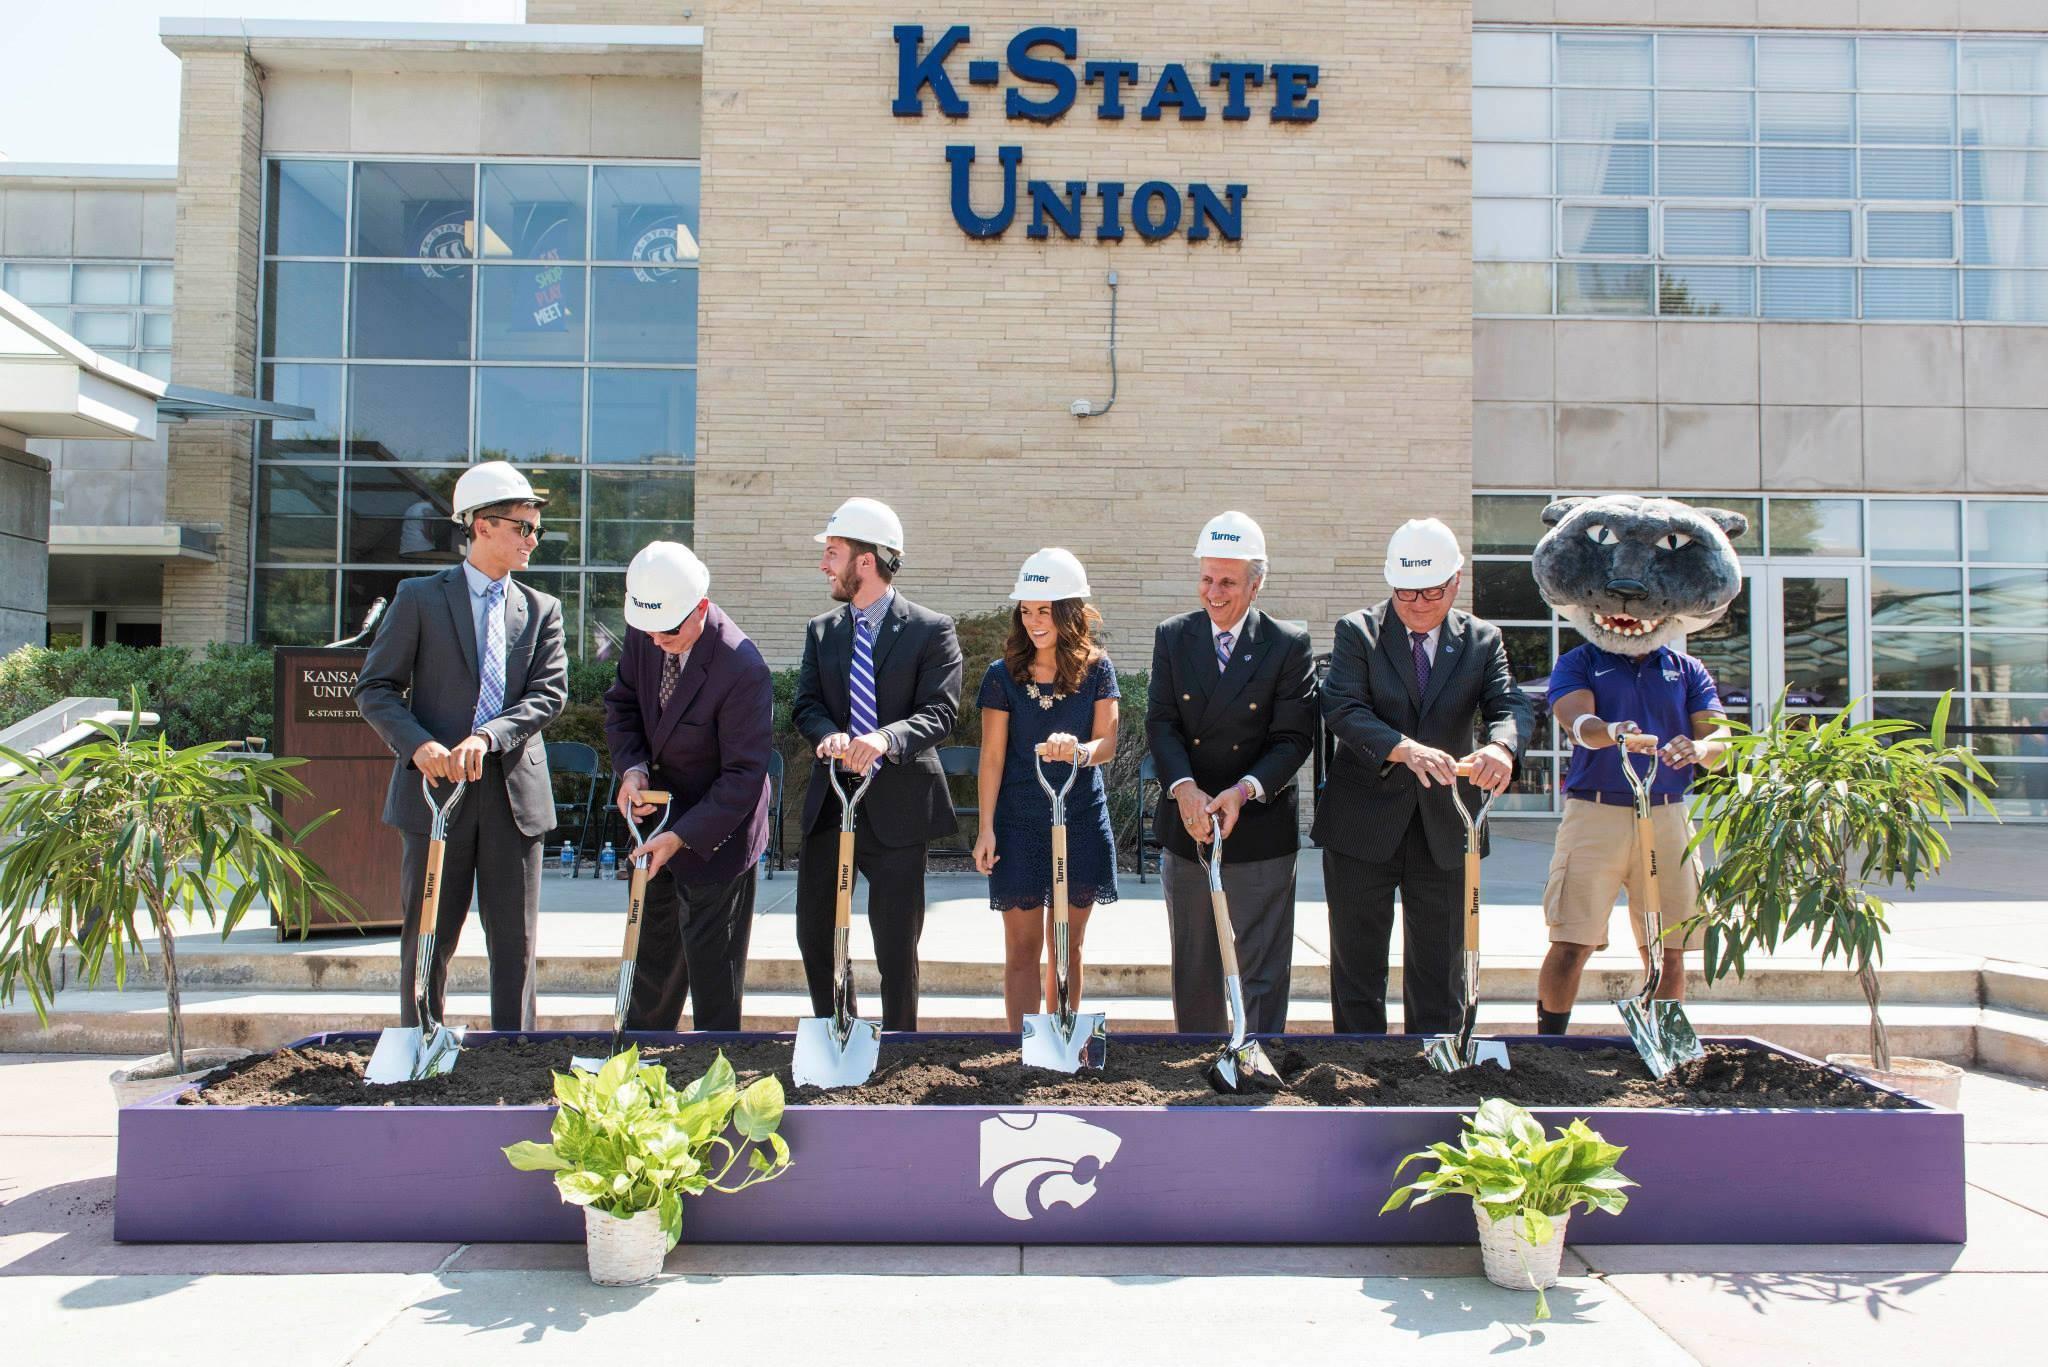 K-State Student Union Renovation Breaks Ground